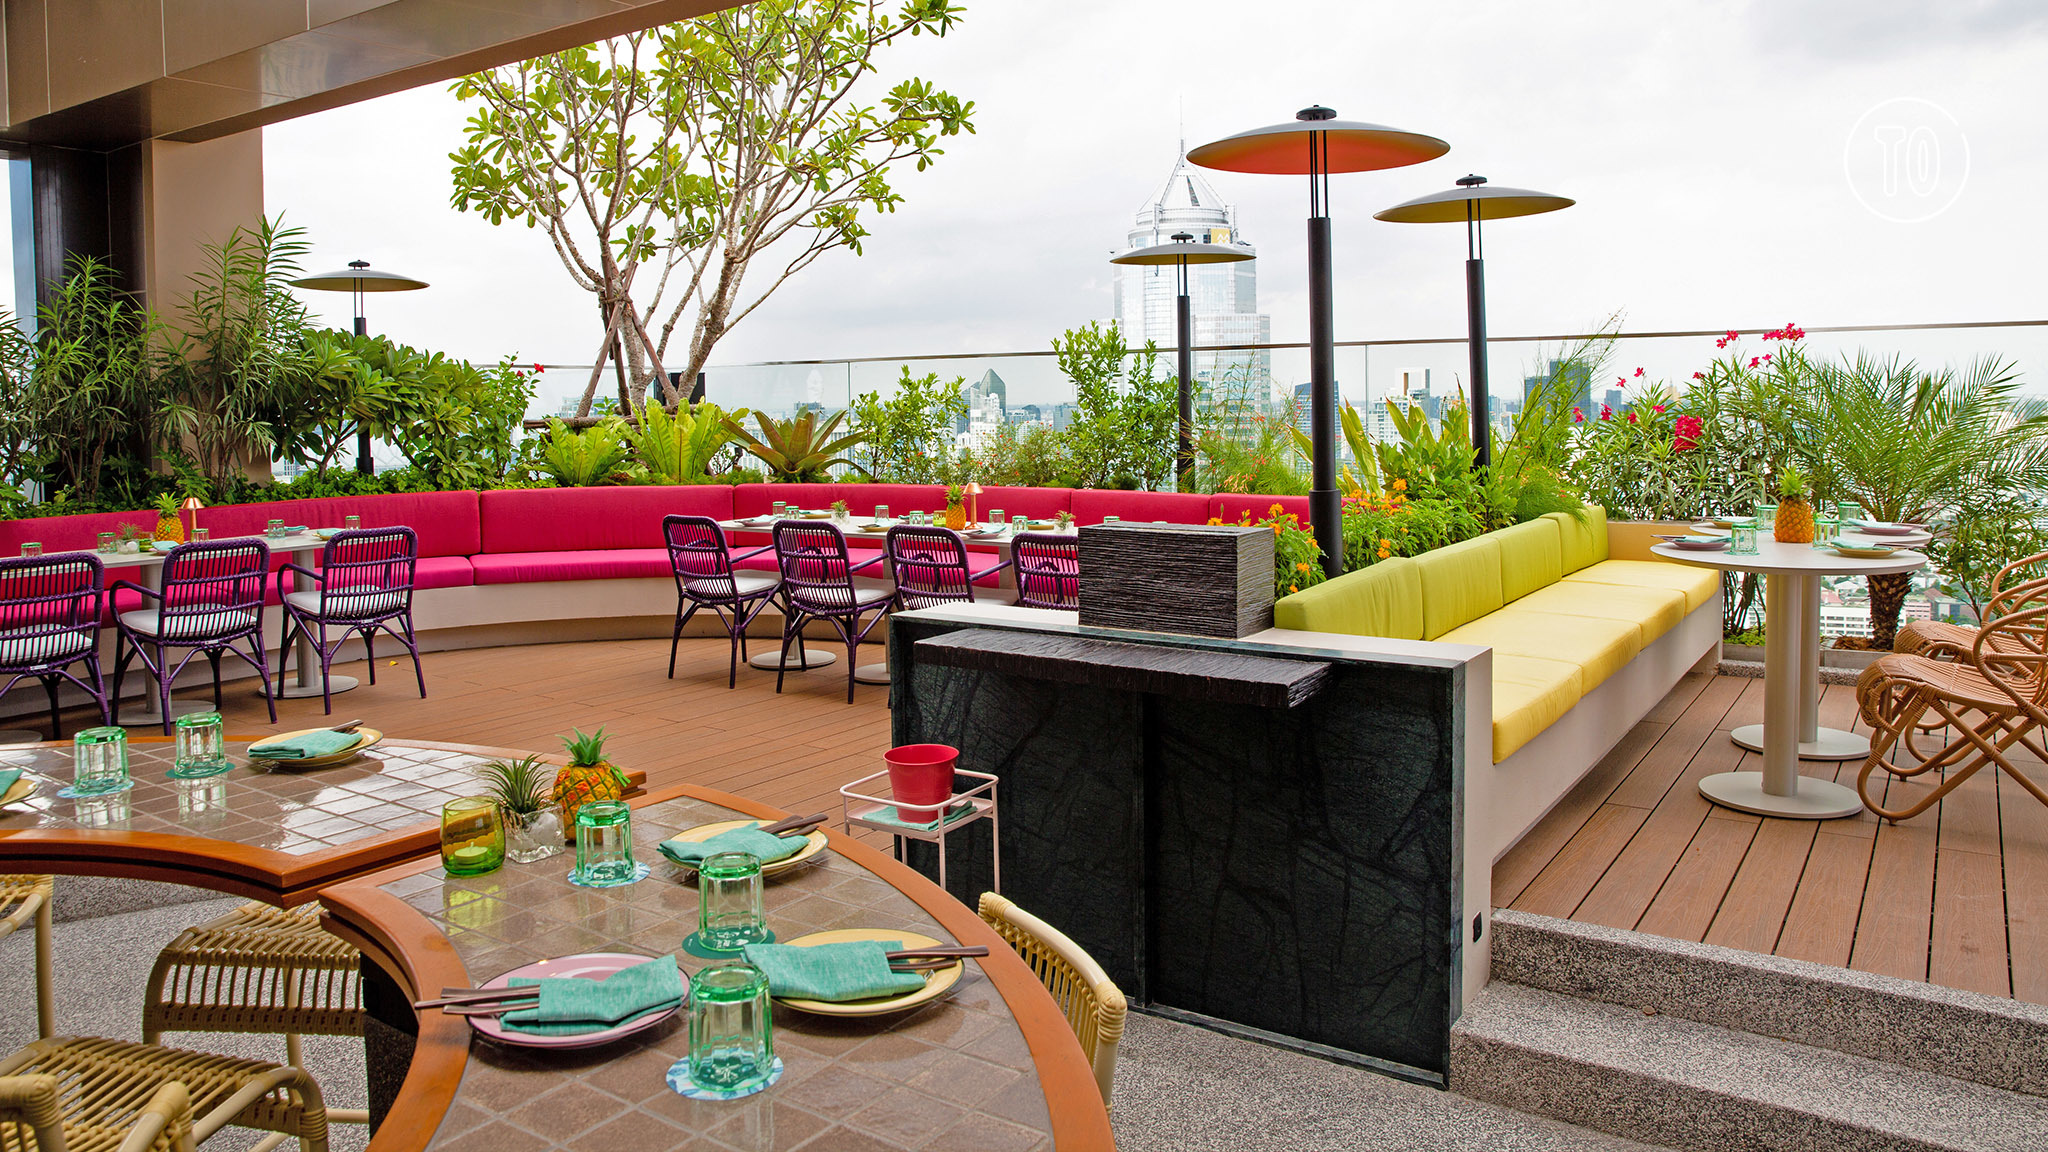 Bar.Yard rooftop restaurant and bar